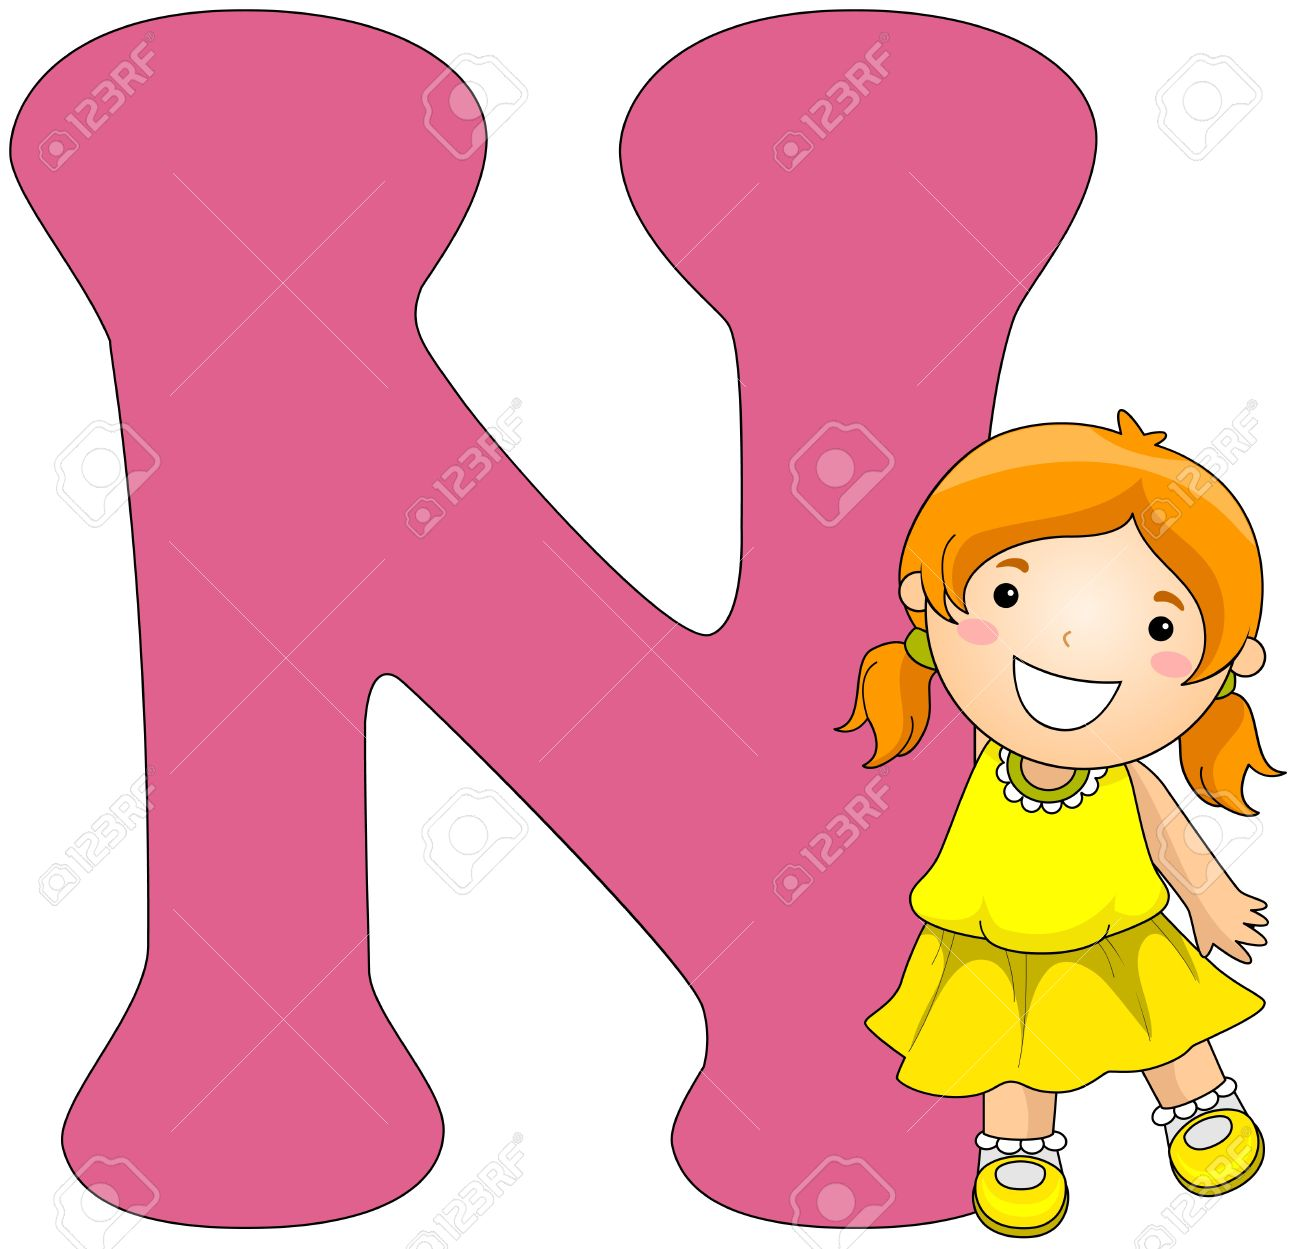 N の文字の横にポーズの女の子のイラスト の写真素材画像素材 Image